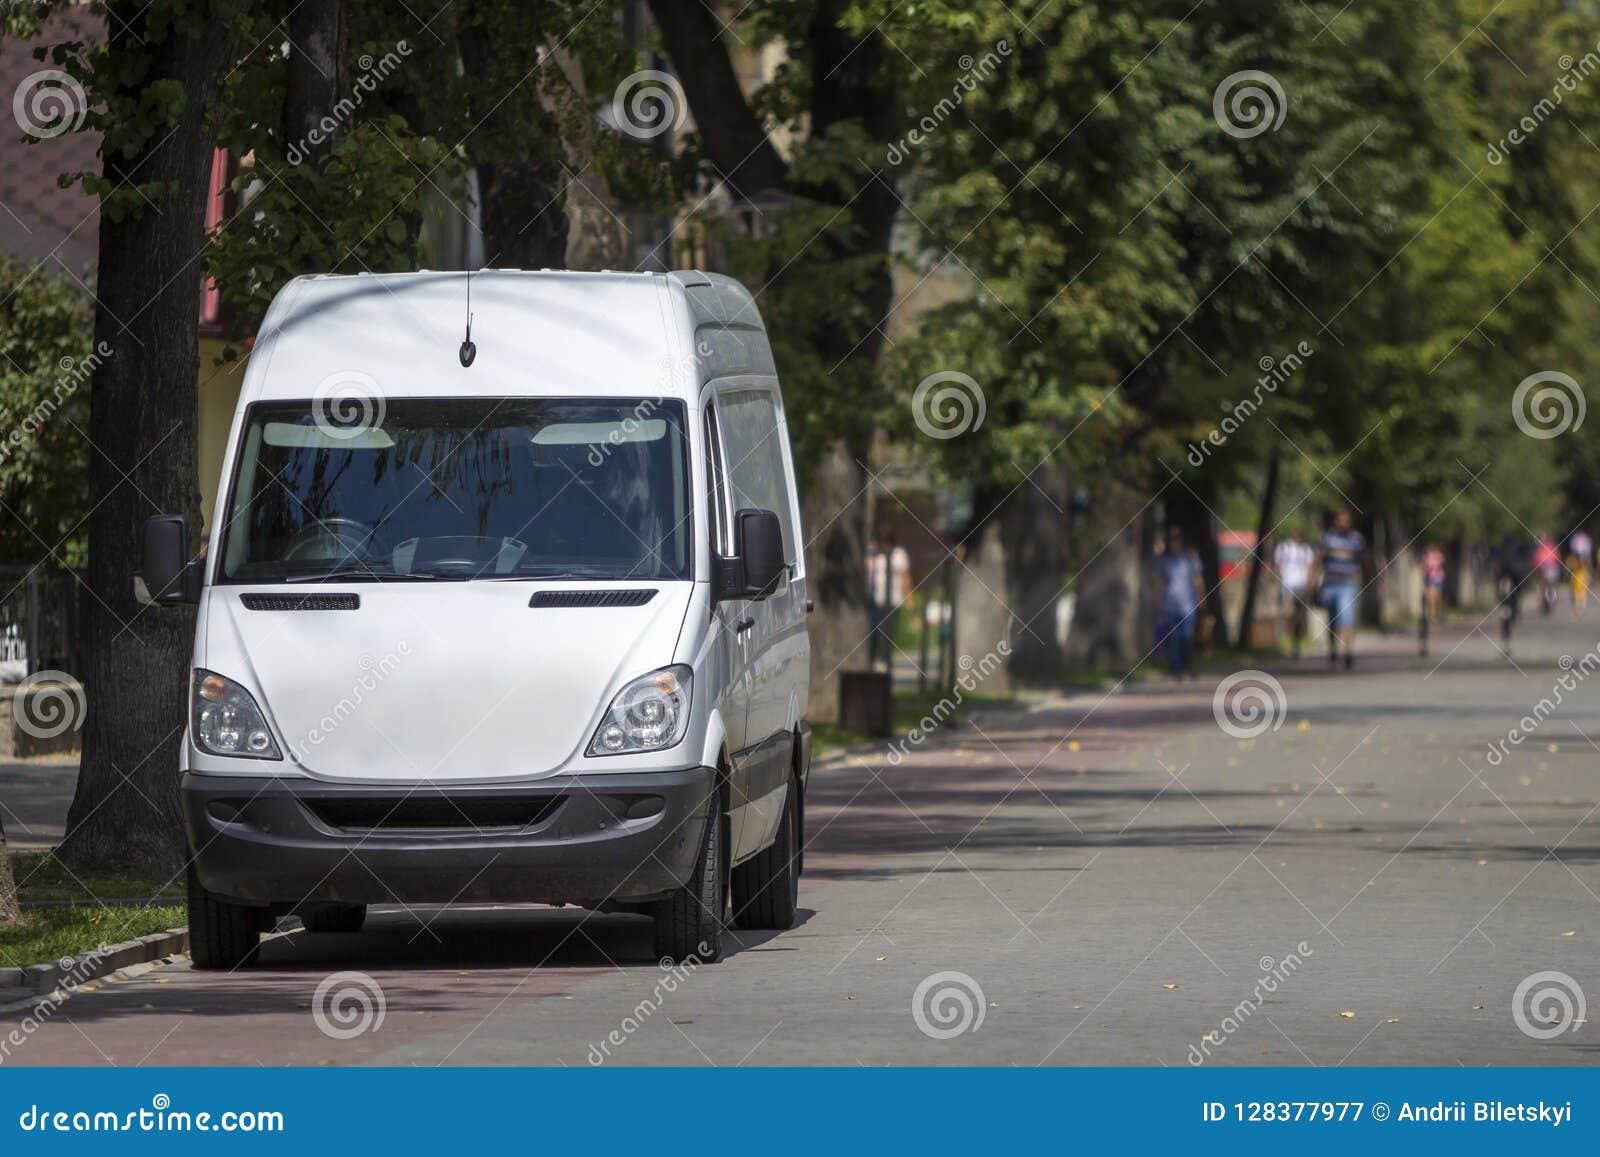 a47ab5b9e0 White Passenger Medium Size Commercial German Luxury Minibus. Stock ...